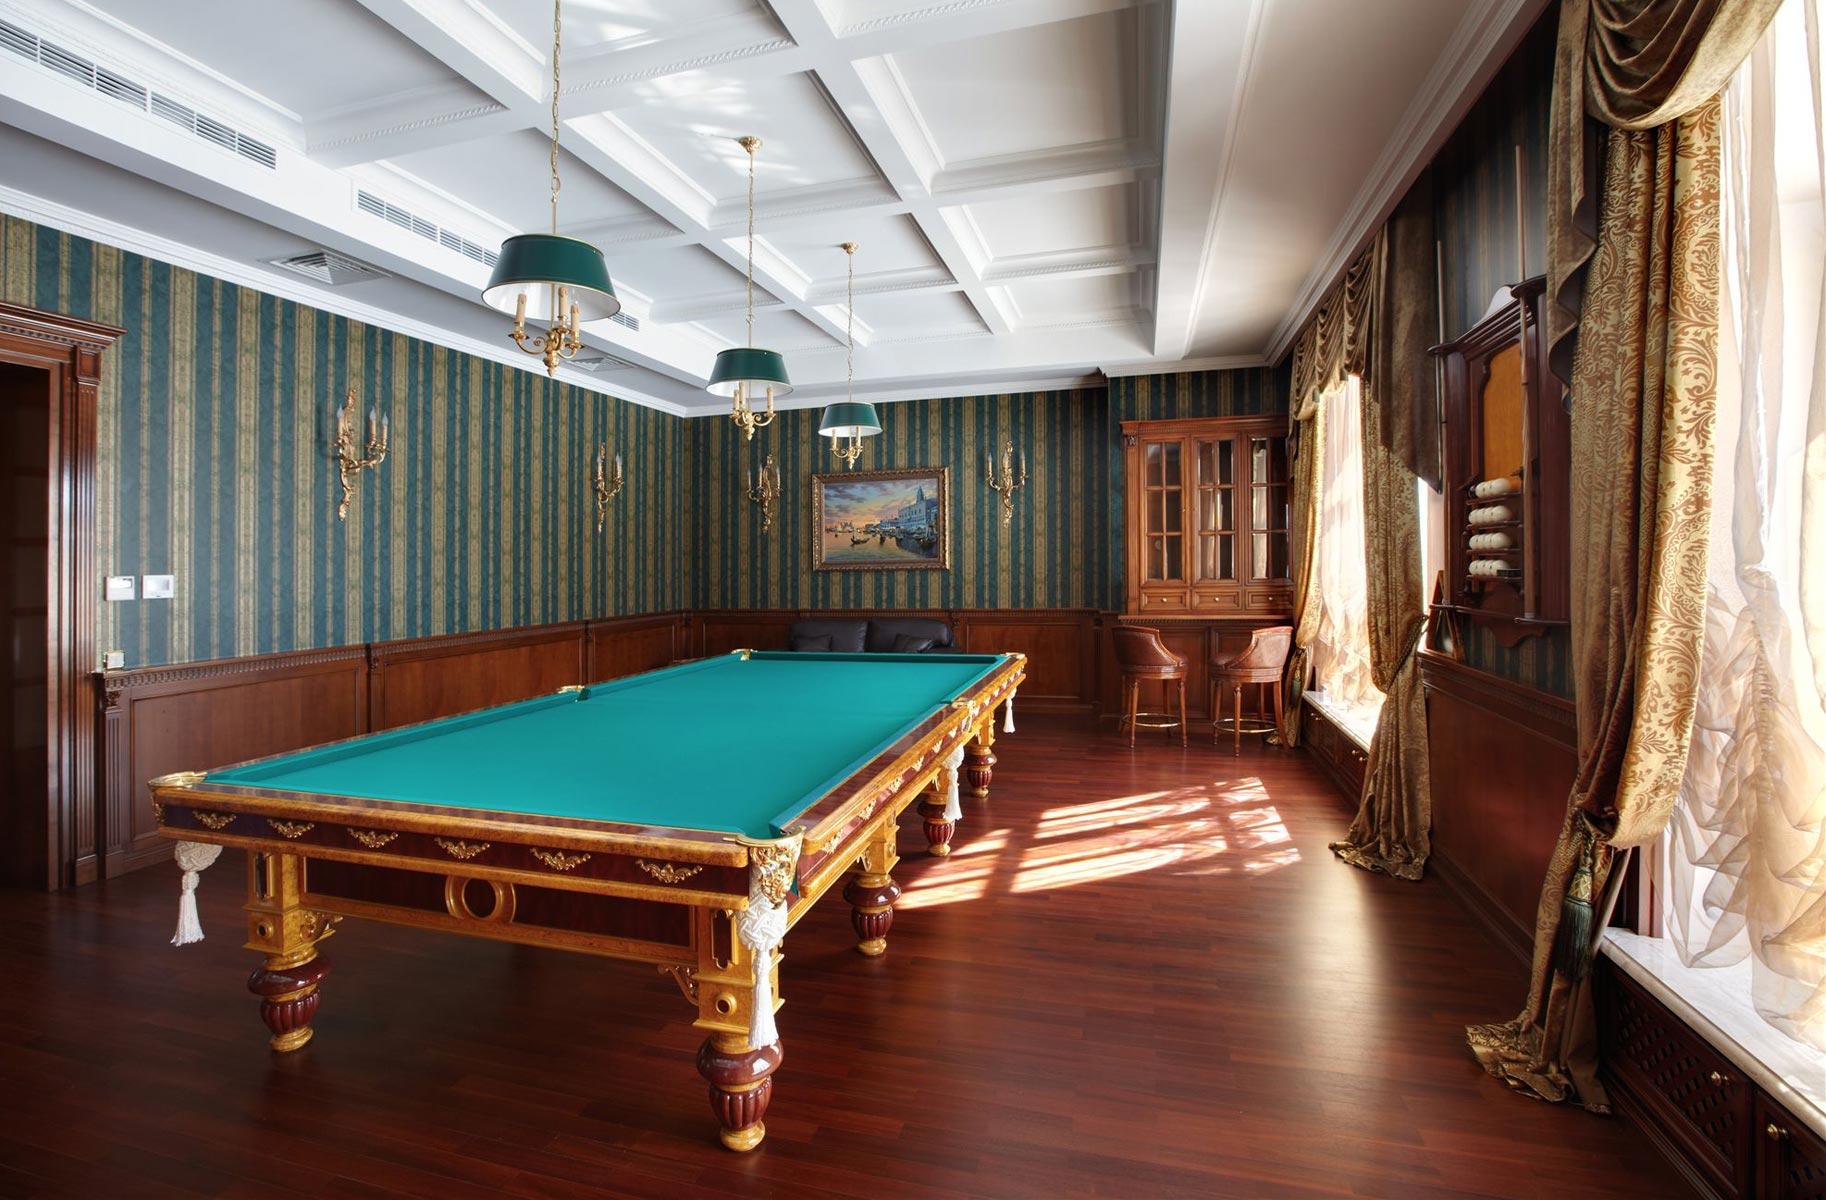 Arredamenti interni di ville di lusso gallery of interni for Interni ville lusso